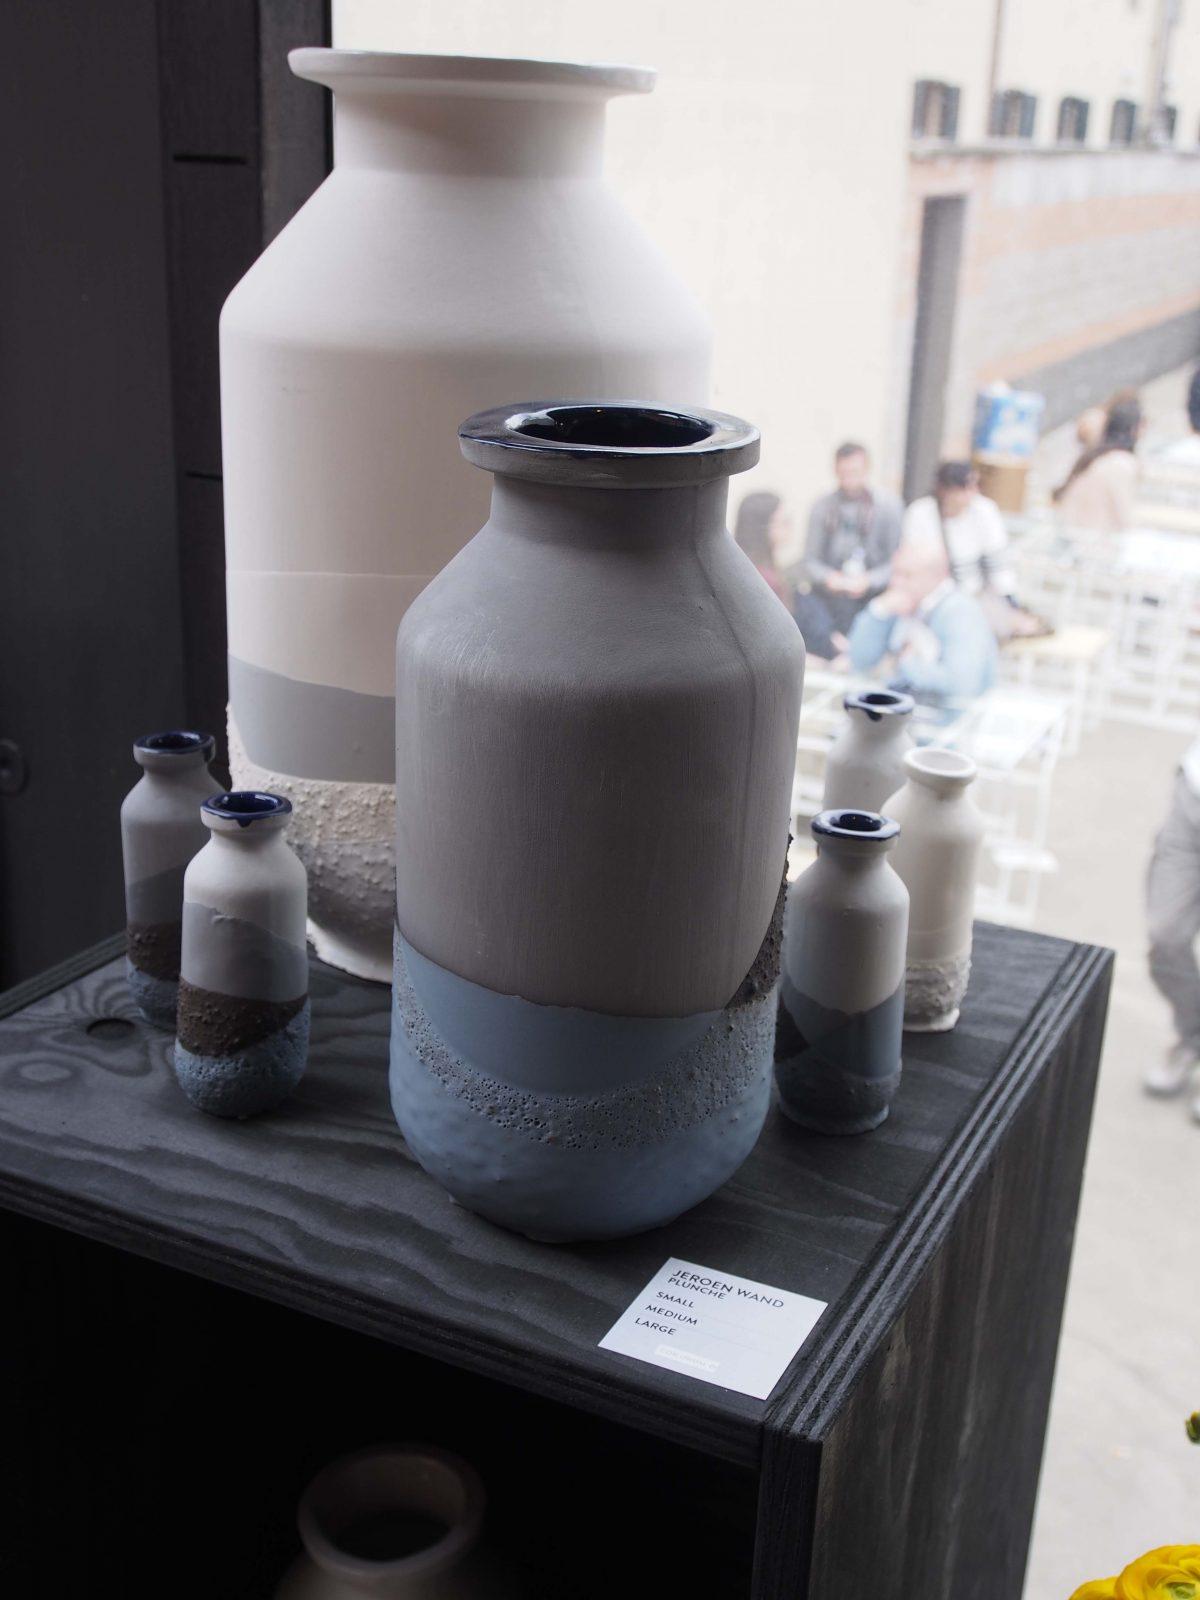 Cor Unum Plunge Vase by Jeroen Wand photo Nanda Rave Gimmii.nl